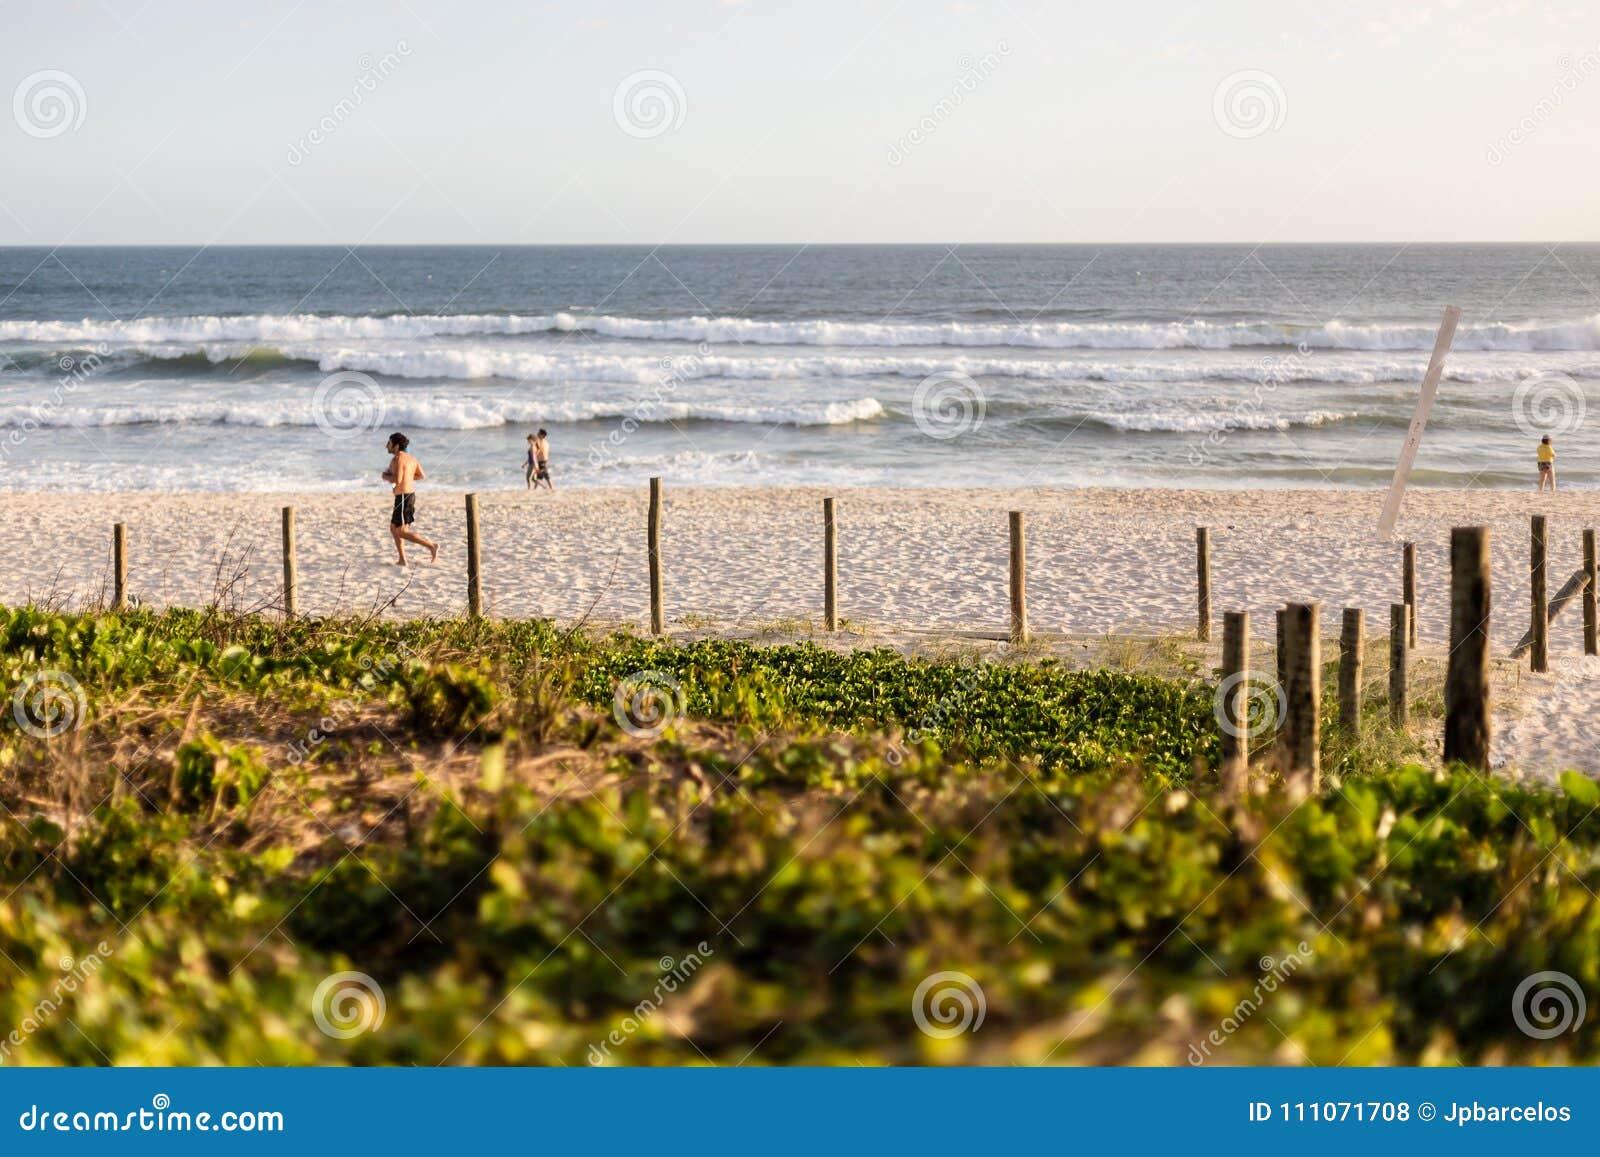 Barra da Tijuca beach on a beatiful afternoon